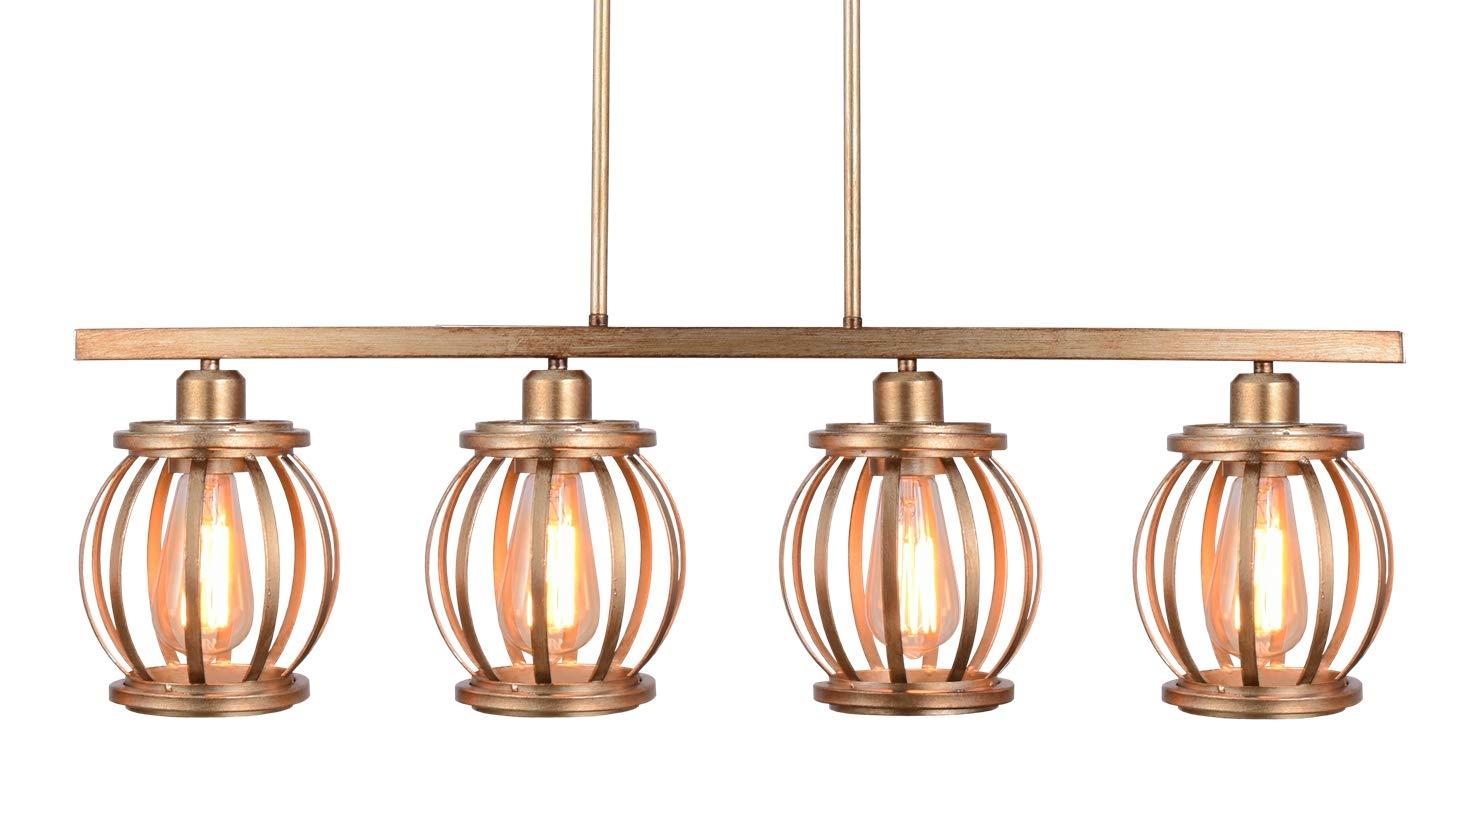 Alice House 32.5'' Kitchen Light Fixtures, 4 Light Island Lighting, Antique Gold Finish,Dining Room Pendant Light, Farmhouse Chandelier AL7091-P4